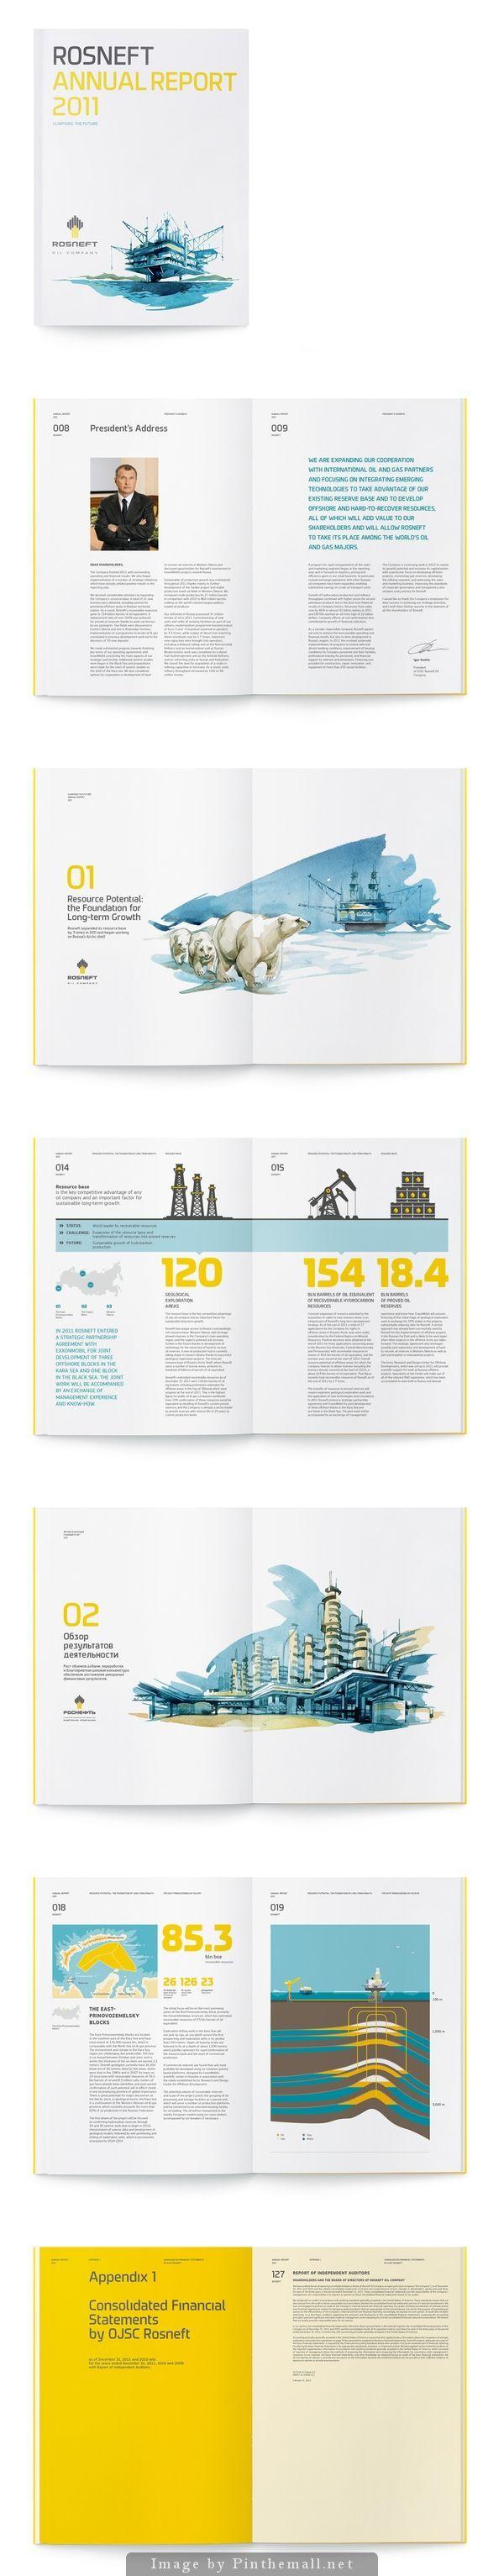 """Rosneft"", Annual Report  by Viktor Miller-Gausa. #jablonskimarketing #marketing"